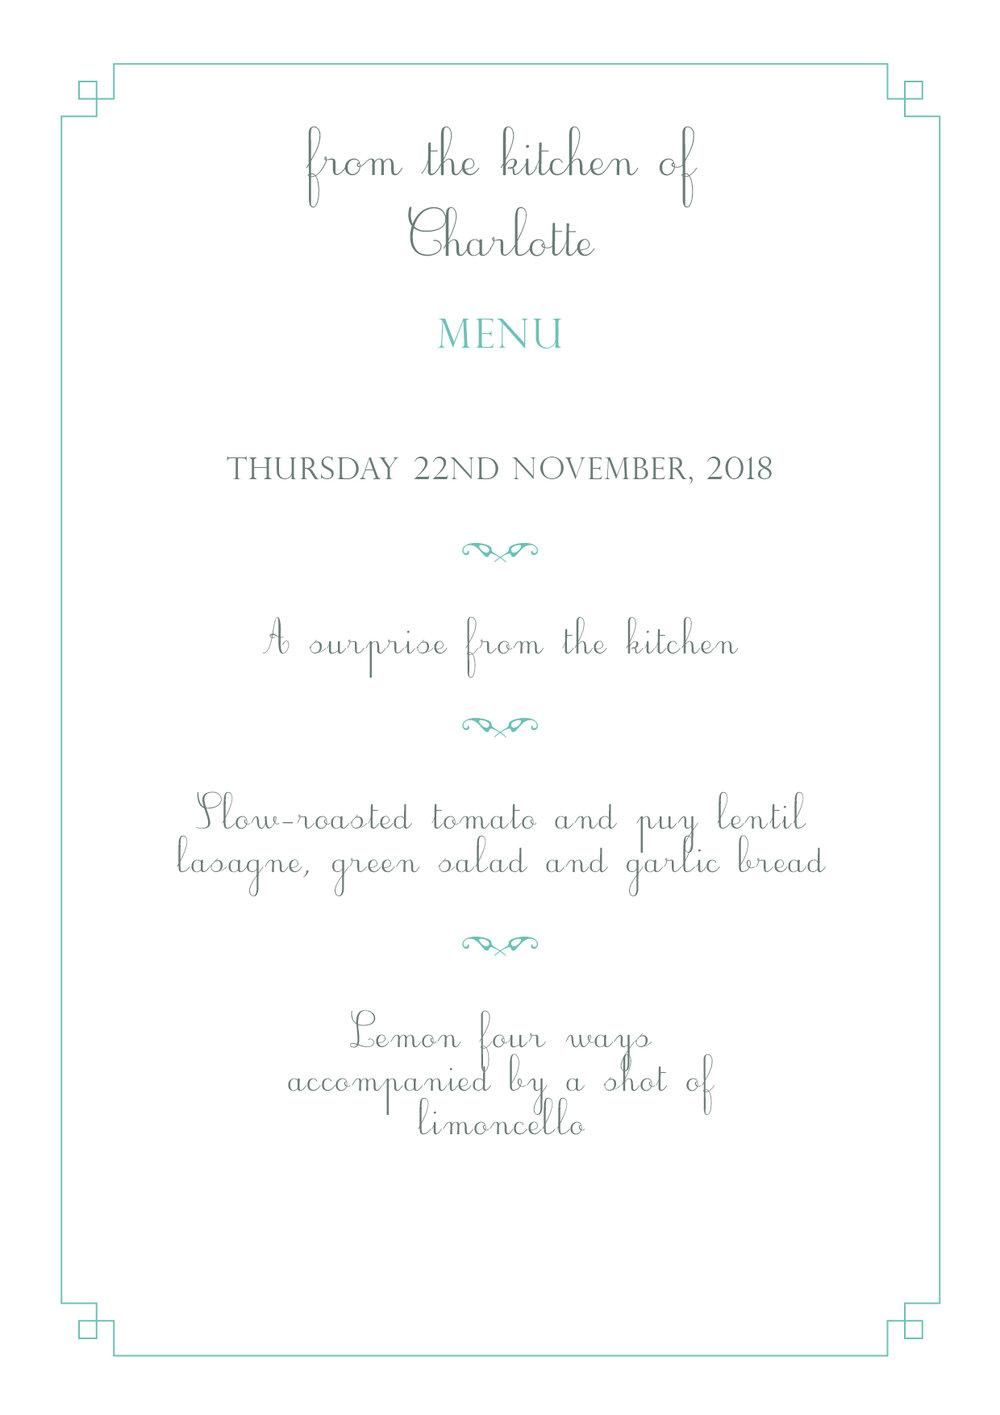 Charlotte's menus 22.11.18.jpg